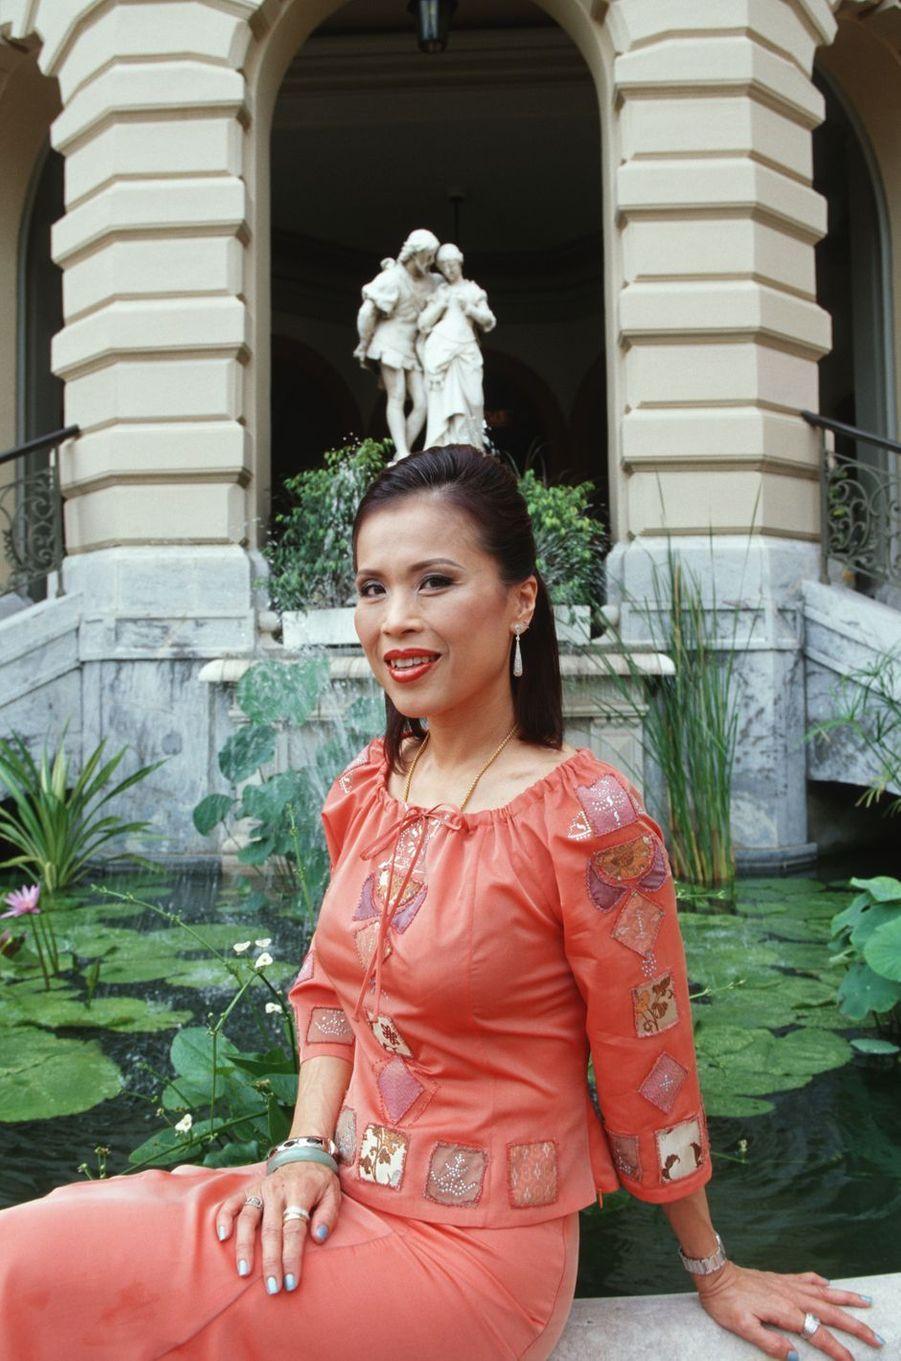 La princesse Ubolratana de Thaïlande à Bangkok, le 1er juillet 2002